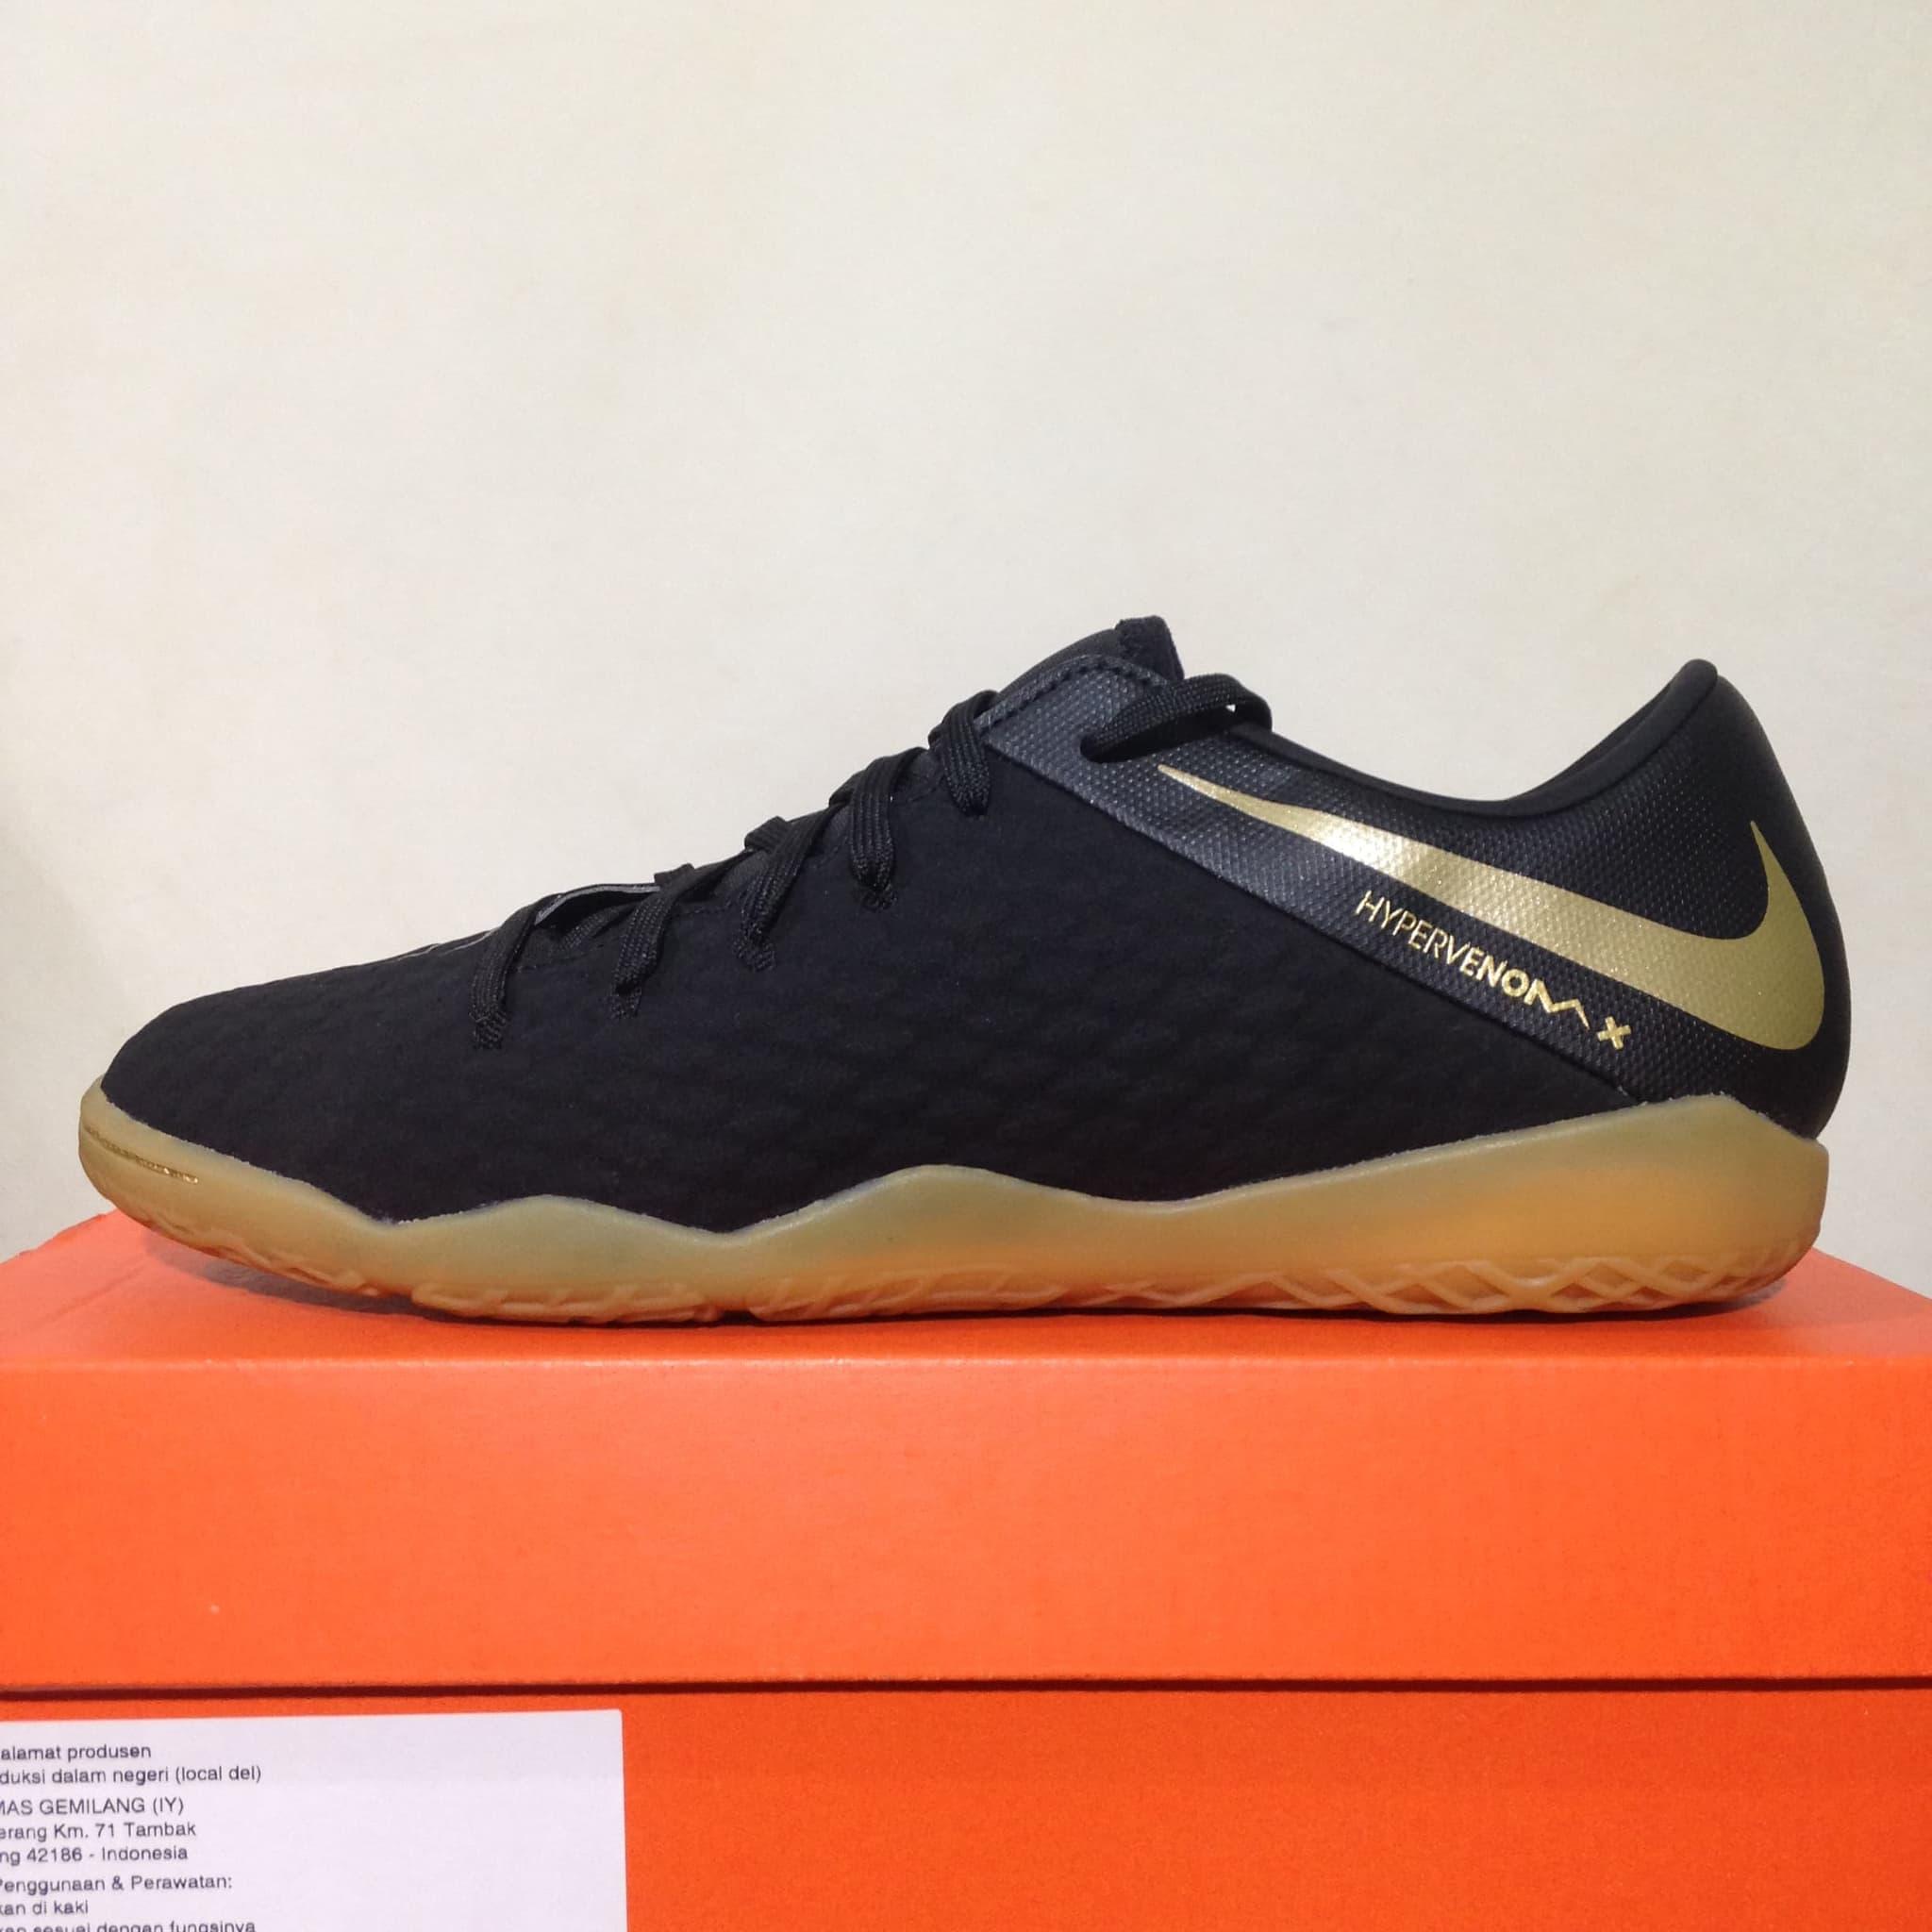 Jual Sepatu Futsal Nike Phantom X 3 Academy Ic Black Gold